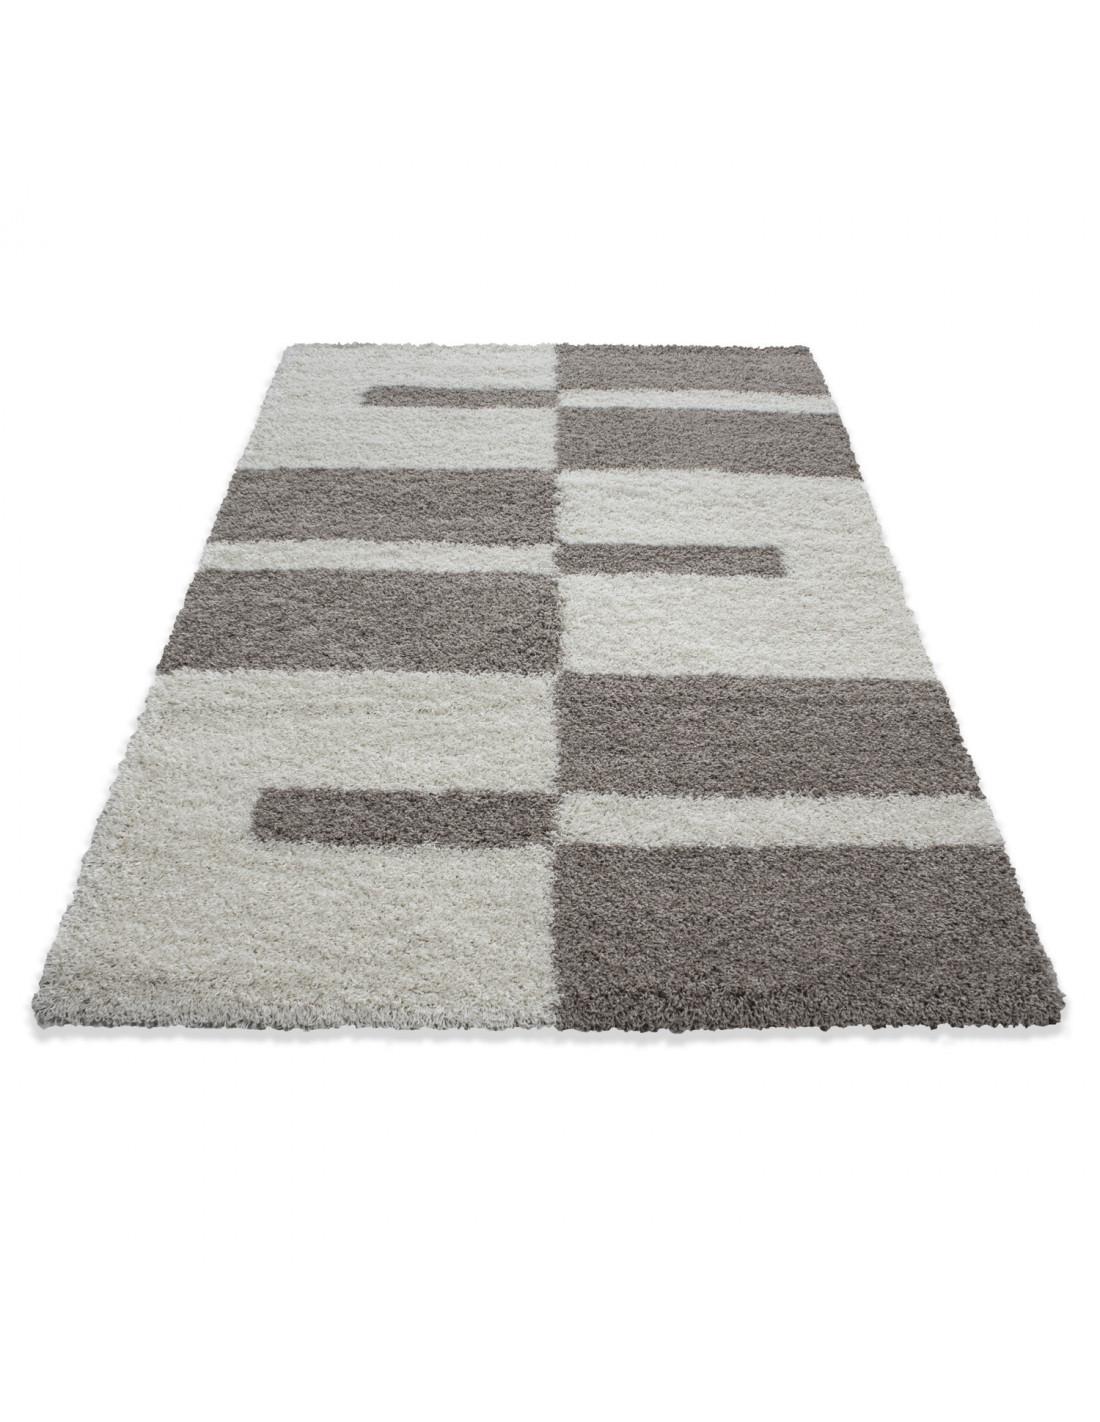 Deep pile long pile living room GALA Shaggy carpet pile height 3cm